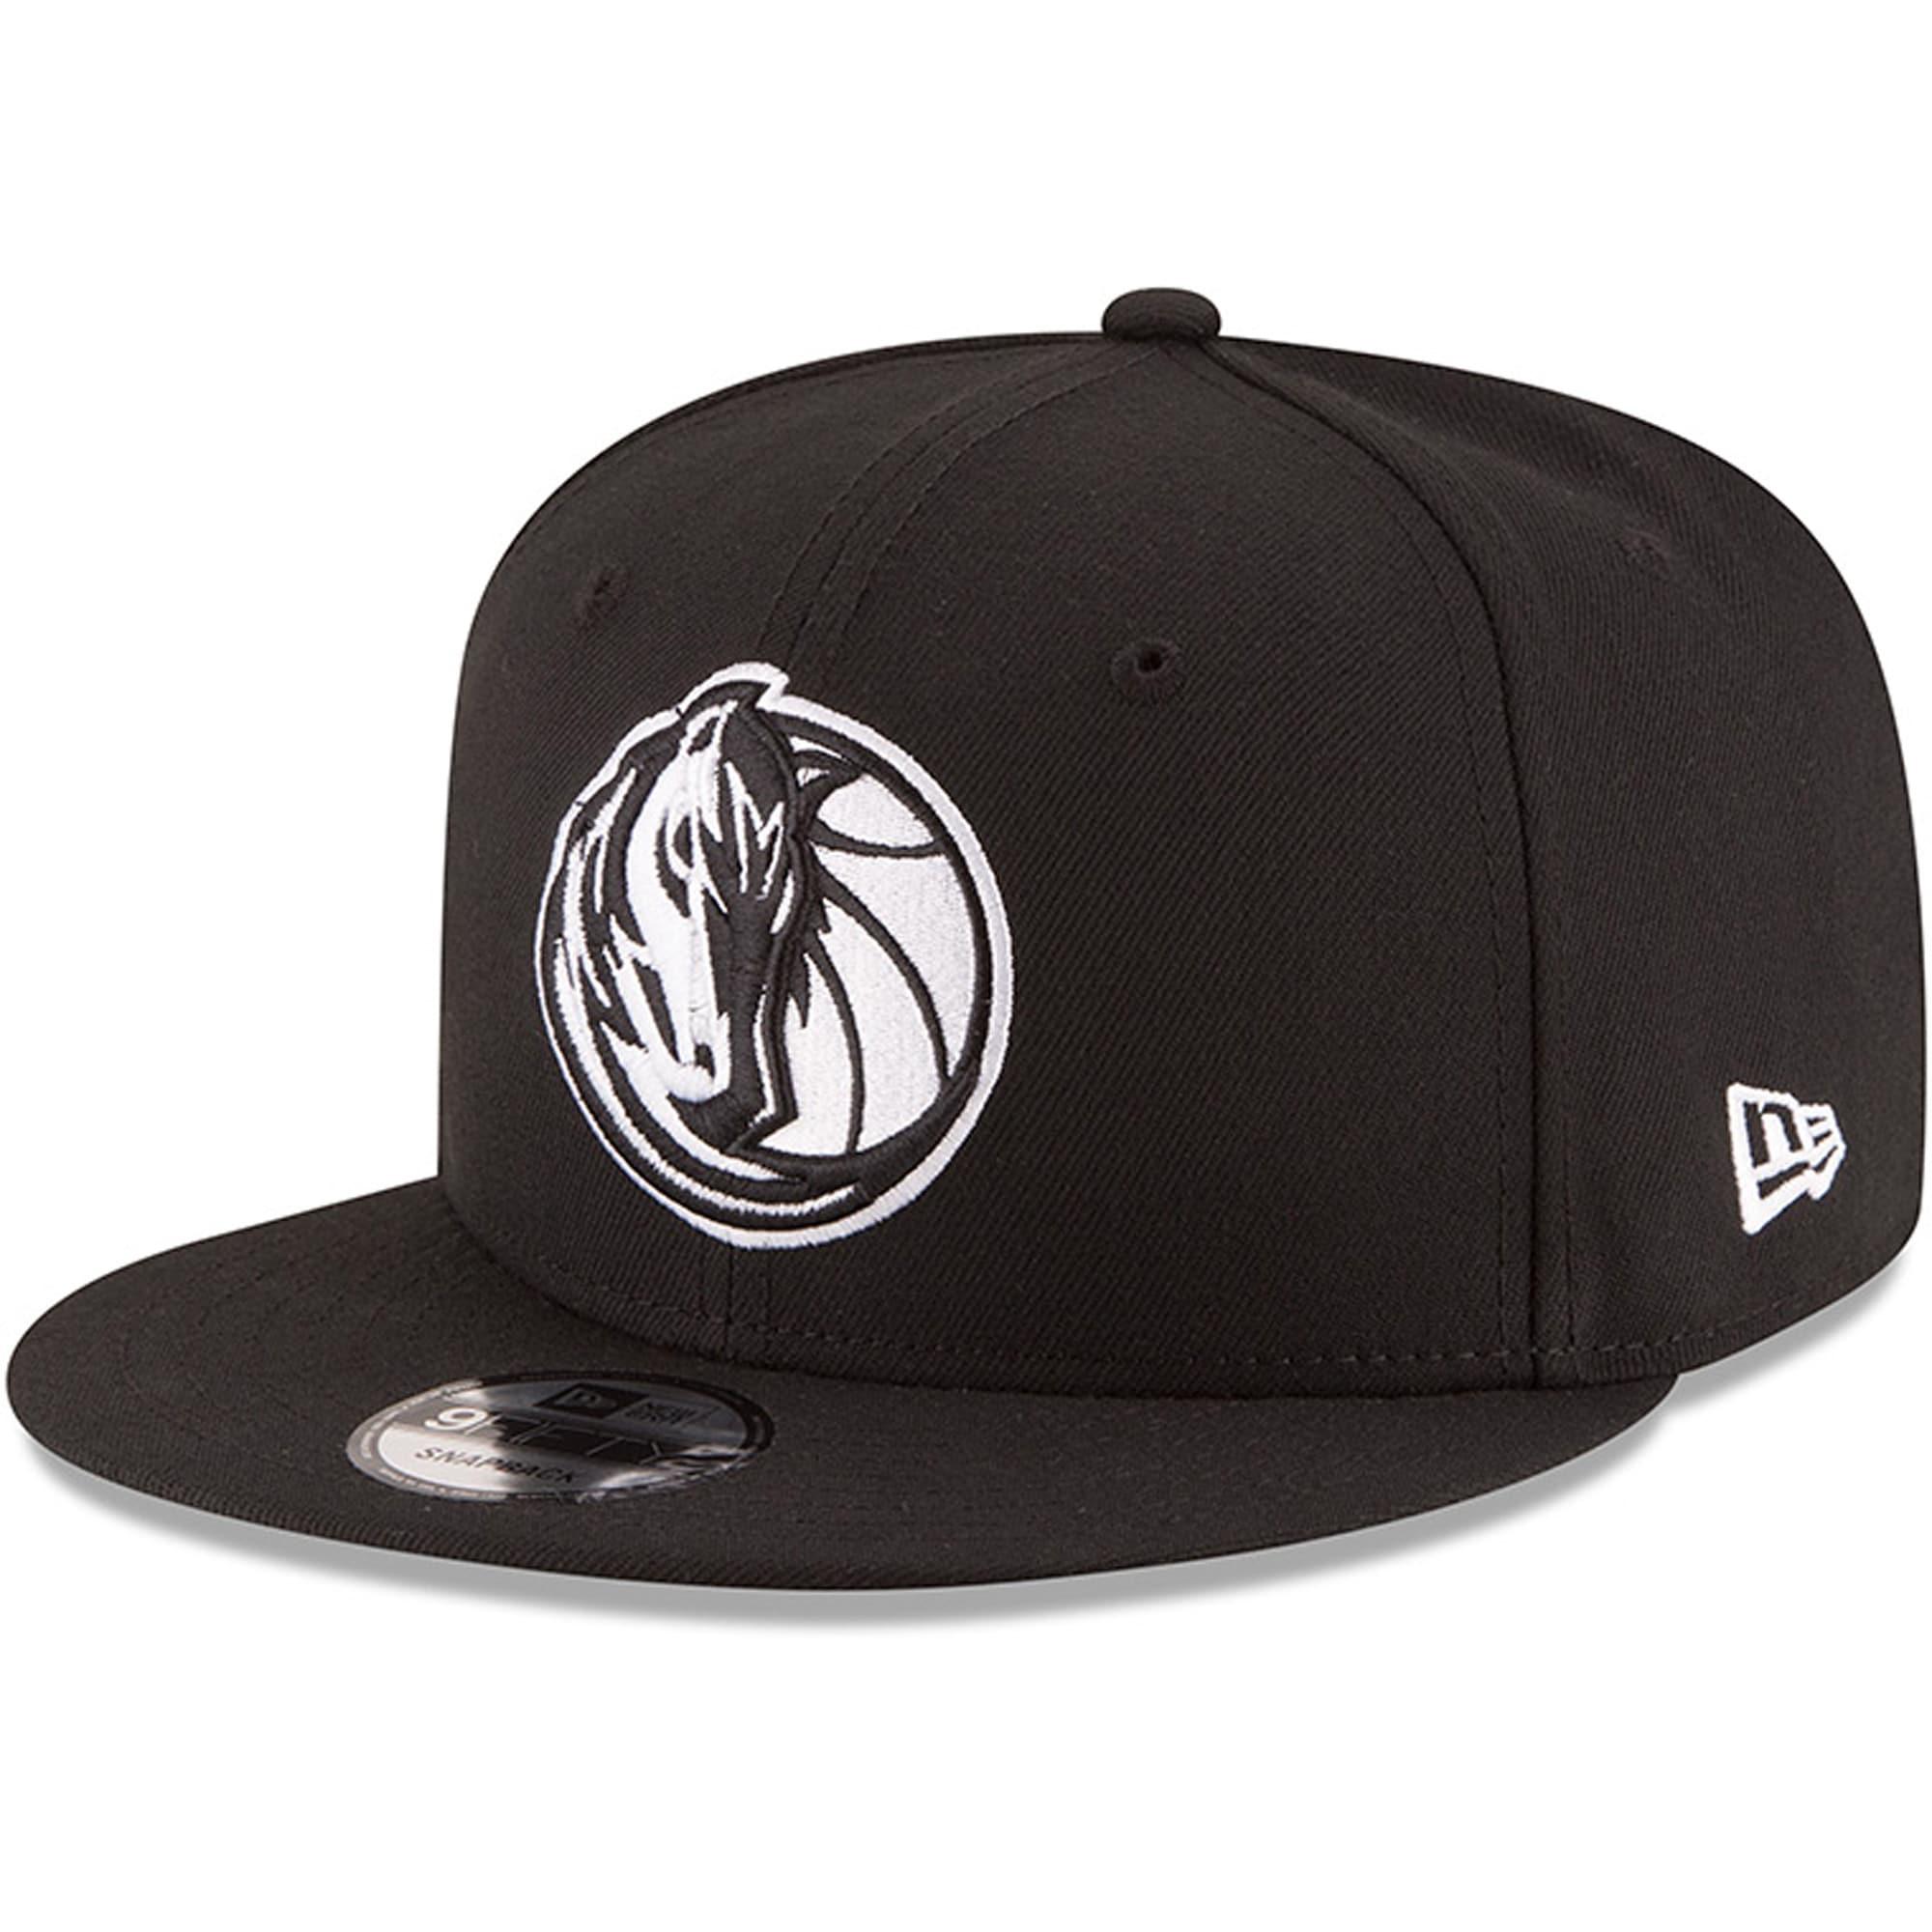 Dallas Mavericks New Era Black & White Logo 9FIFTY Adjustable Snapback Hat - Black